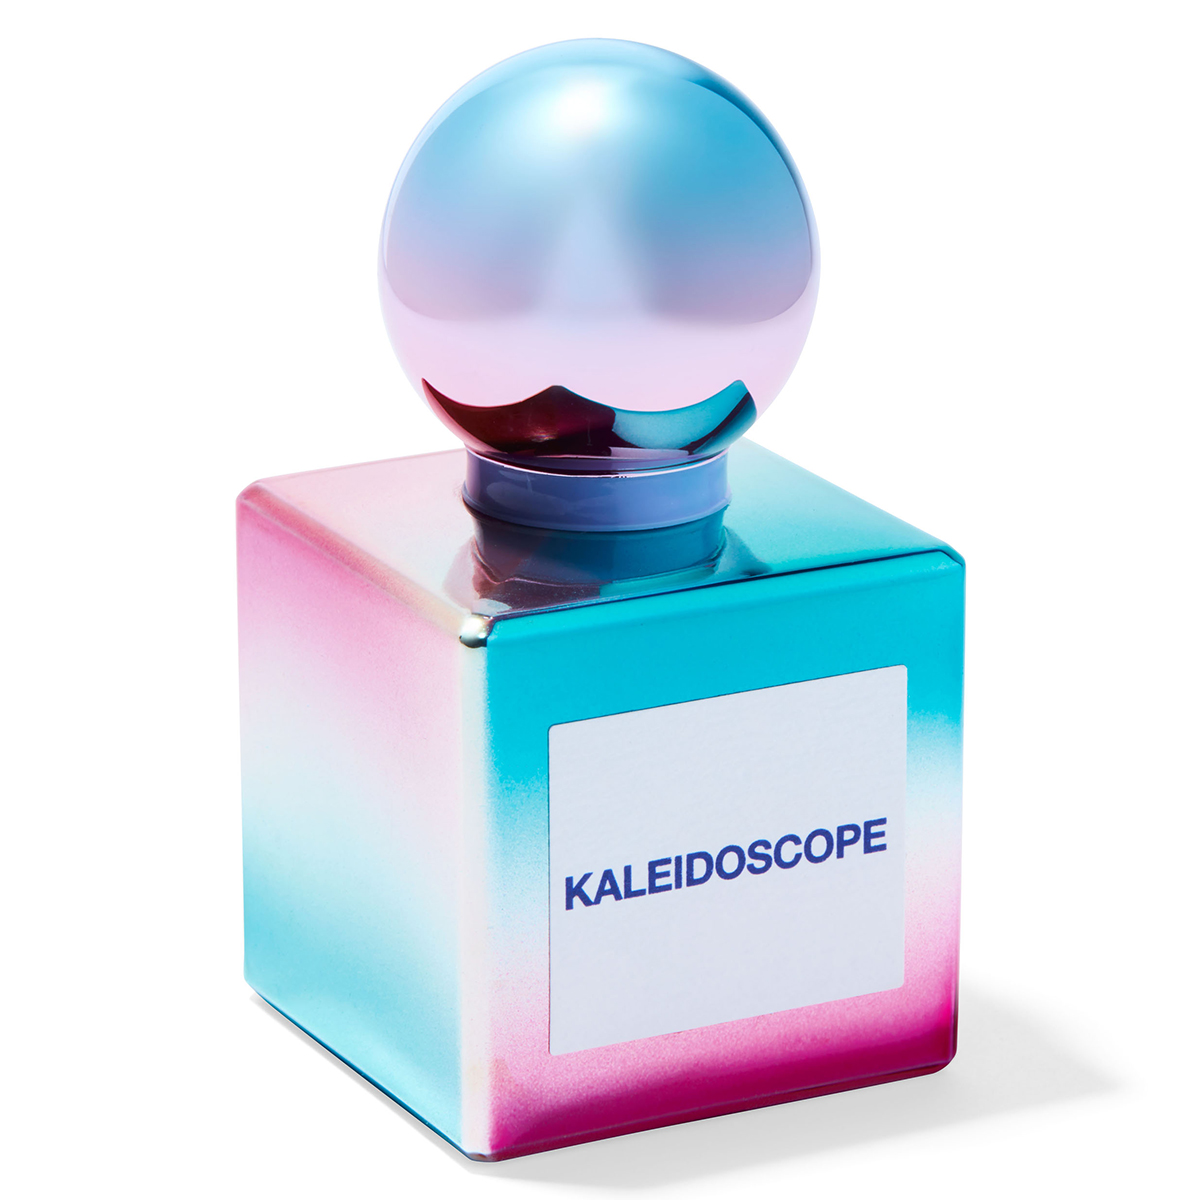 Bath and Body Works Kaleidoscope Eau De Parfum